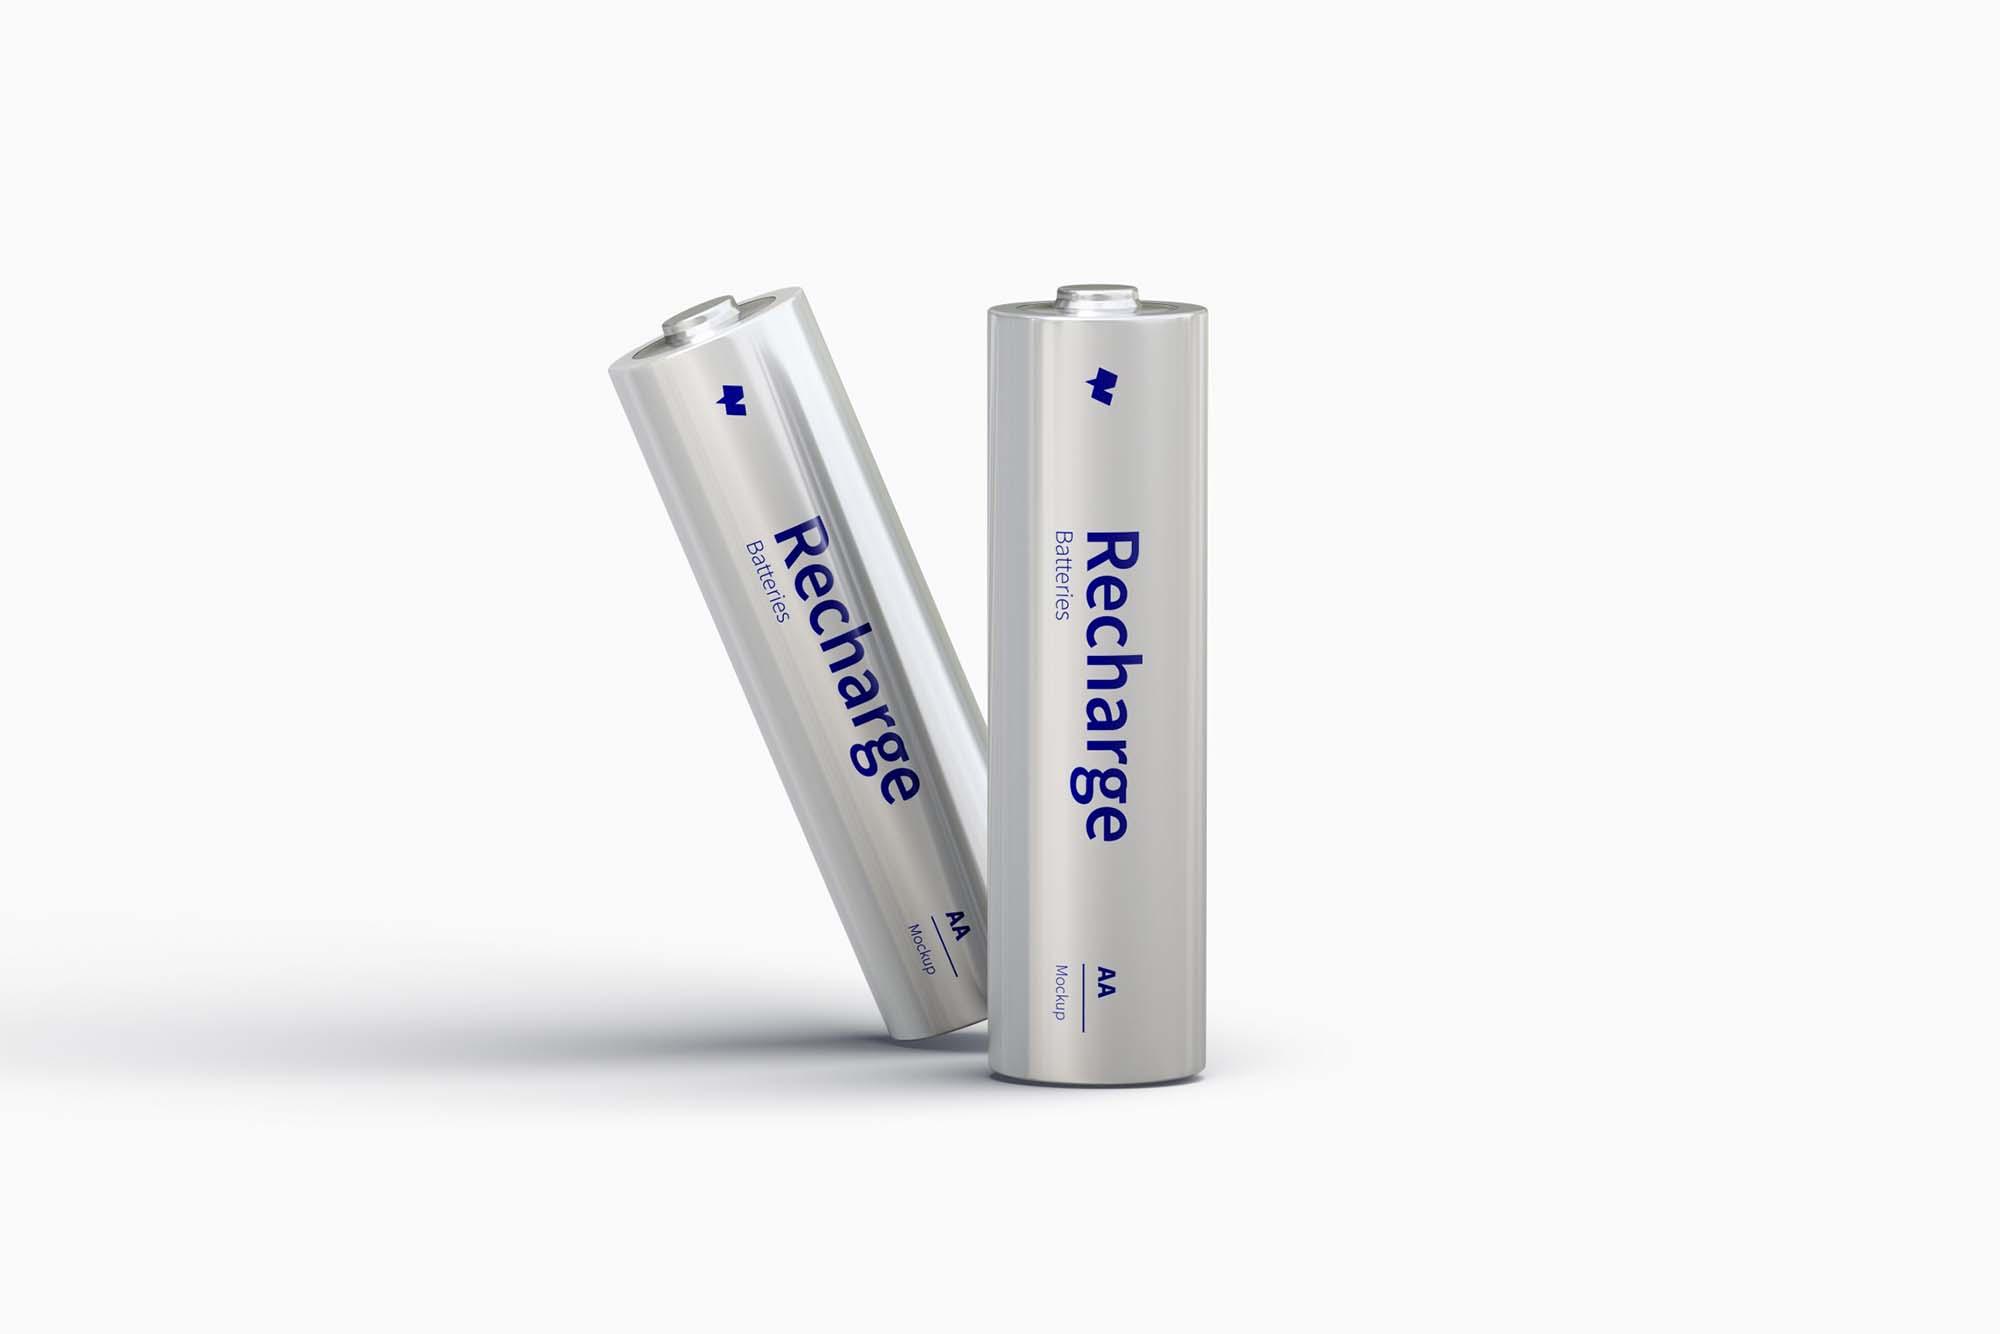 AA Batteries Mockup 4